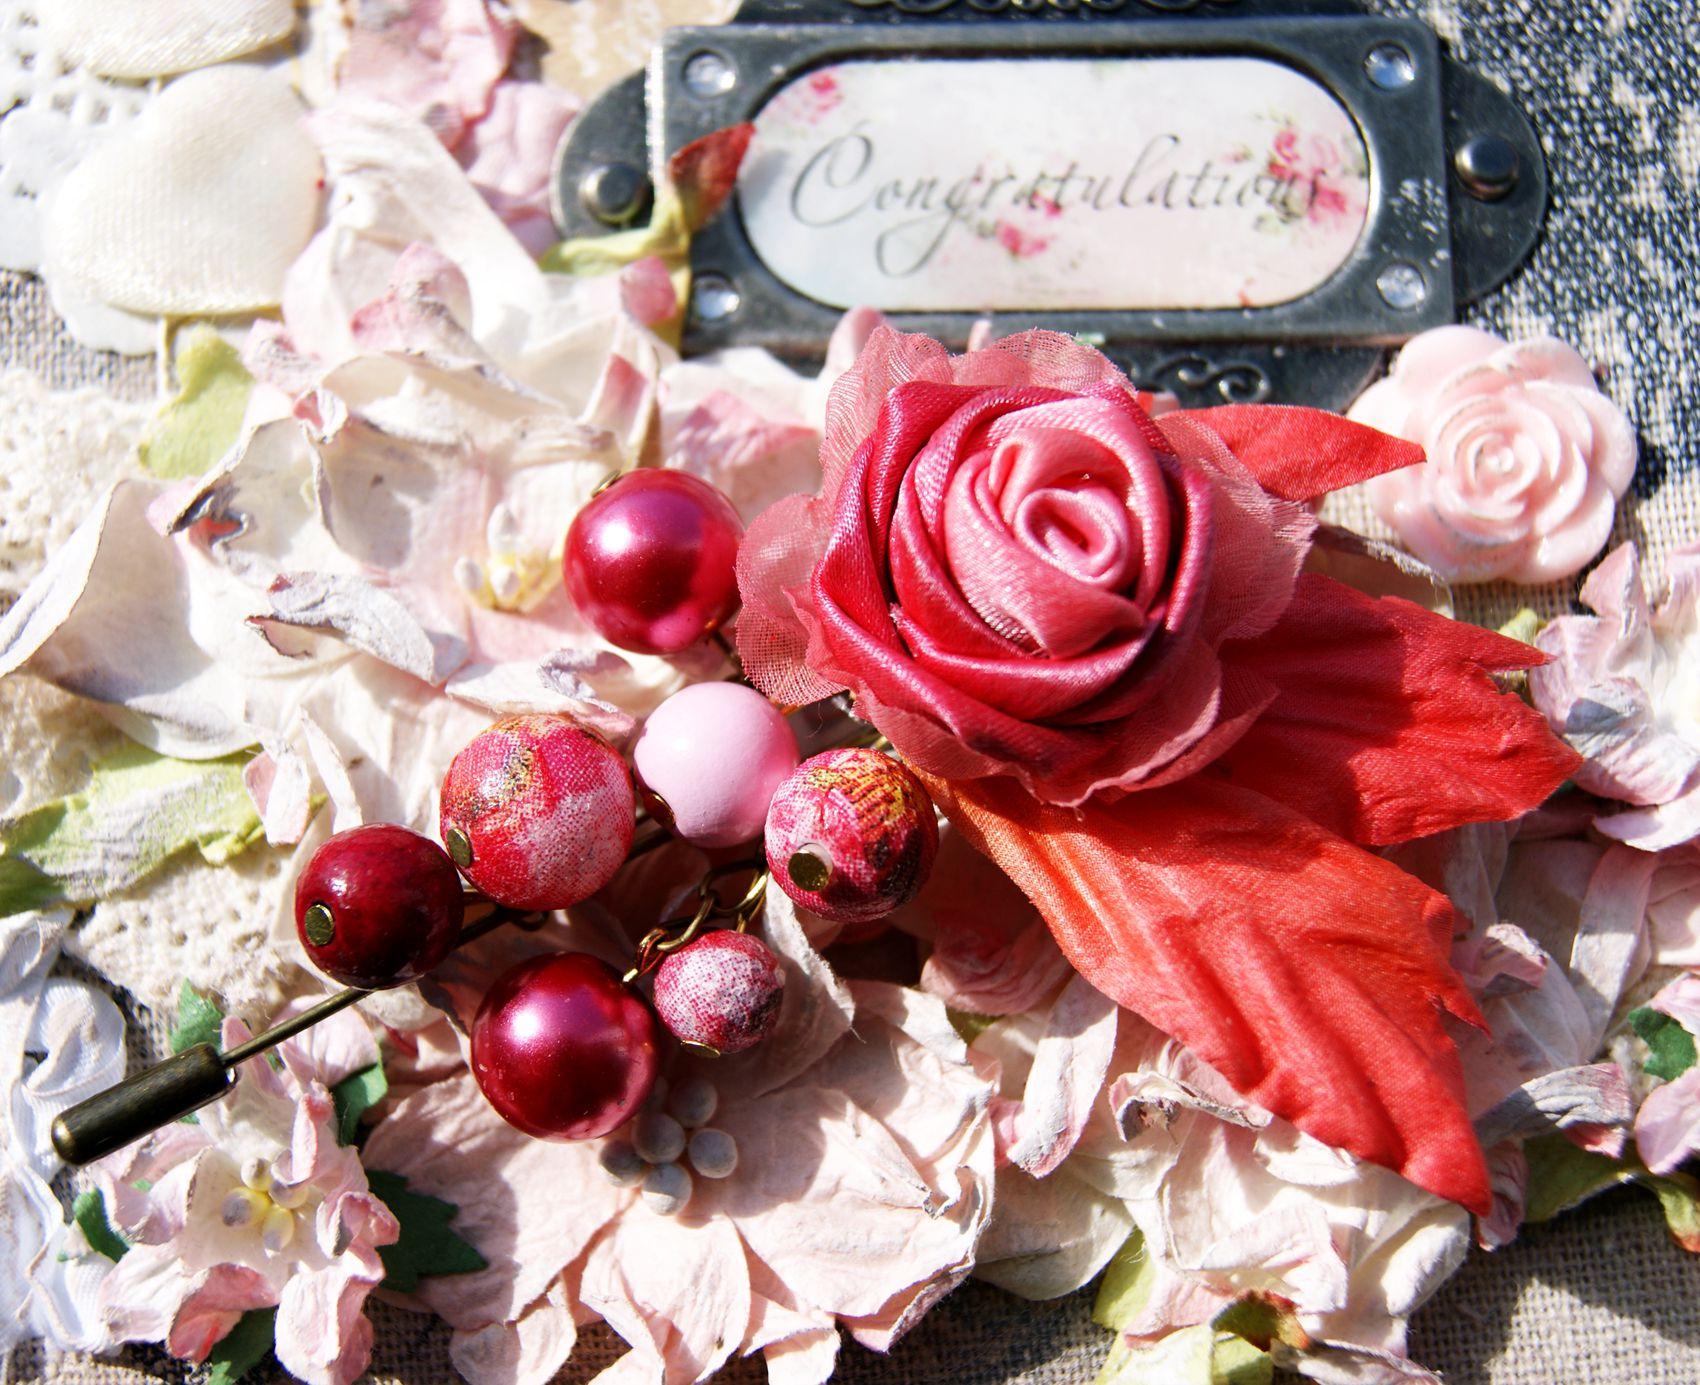 шелк подарок роза булавка